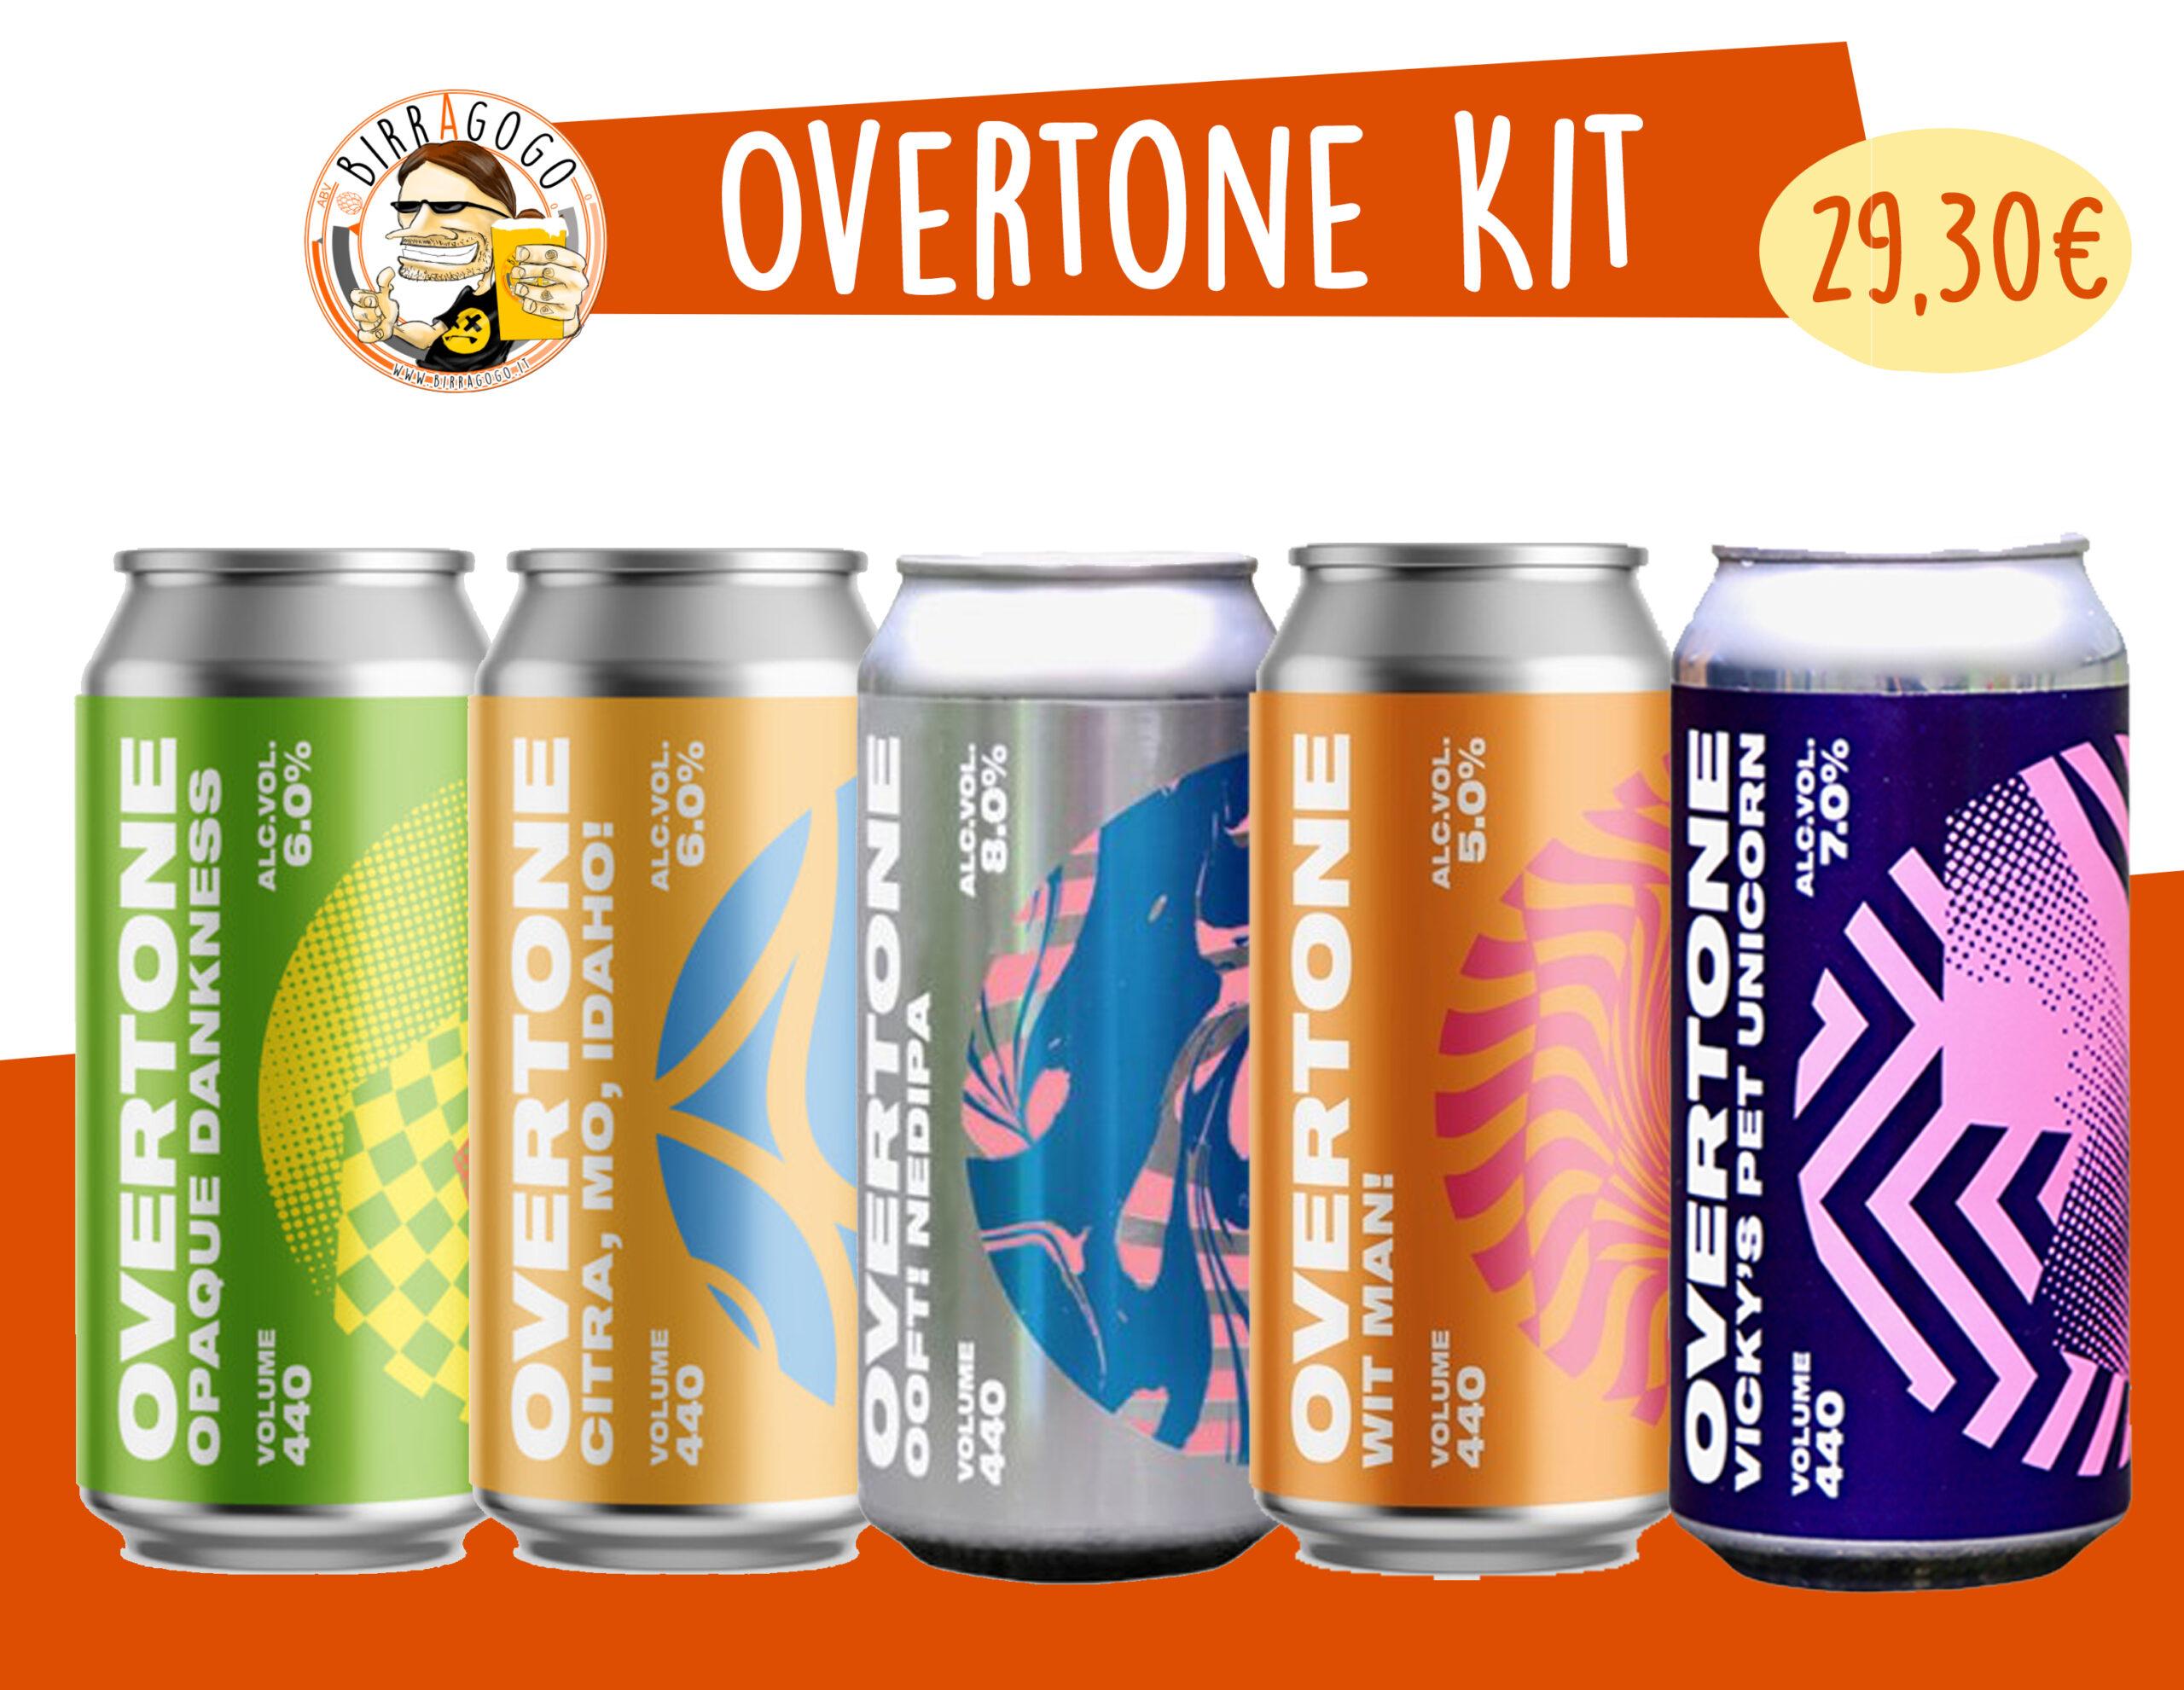 Overtone Kit